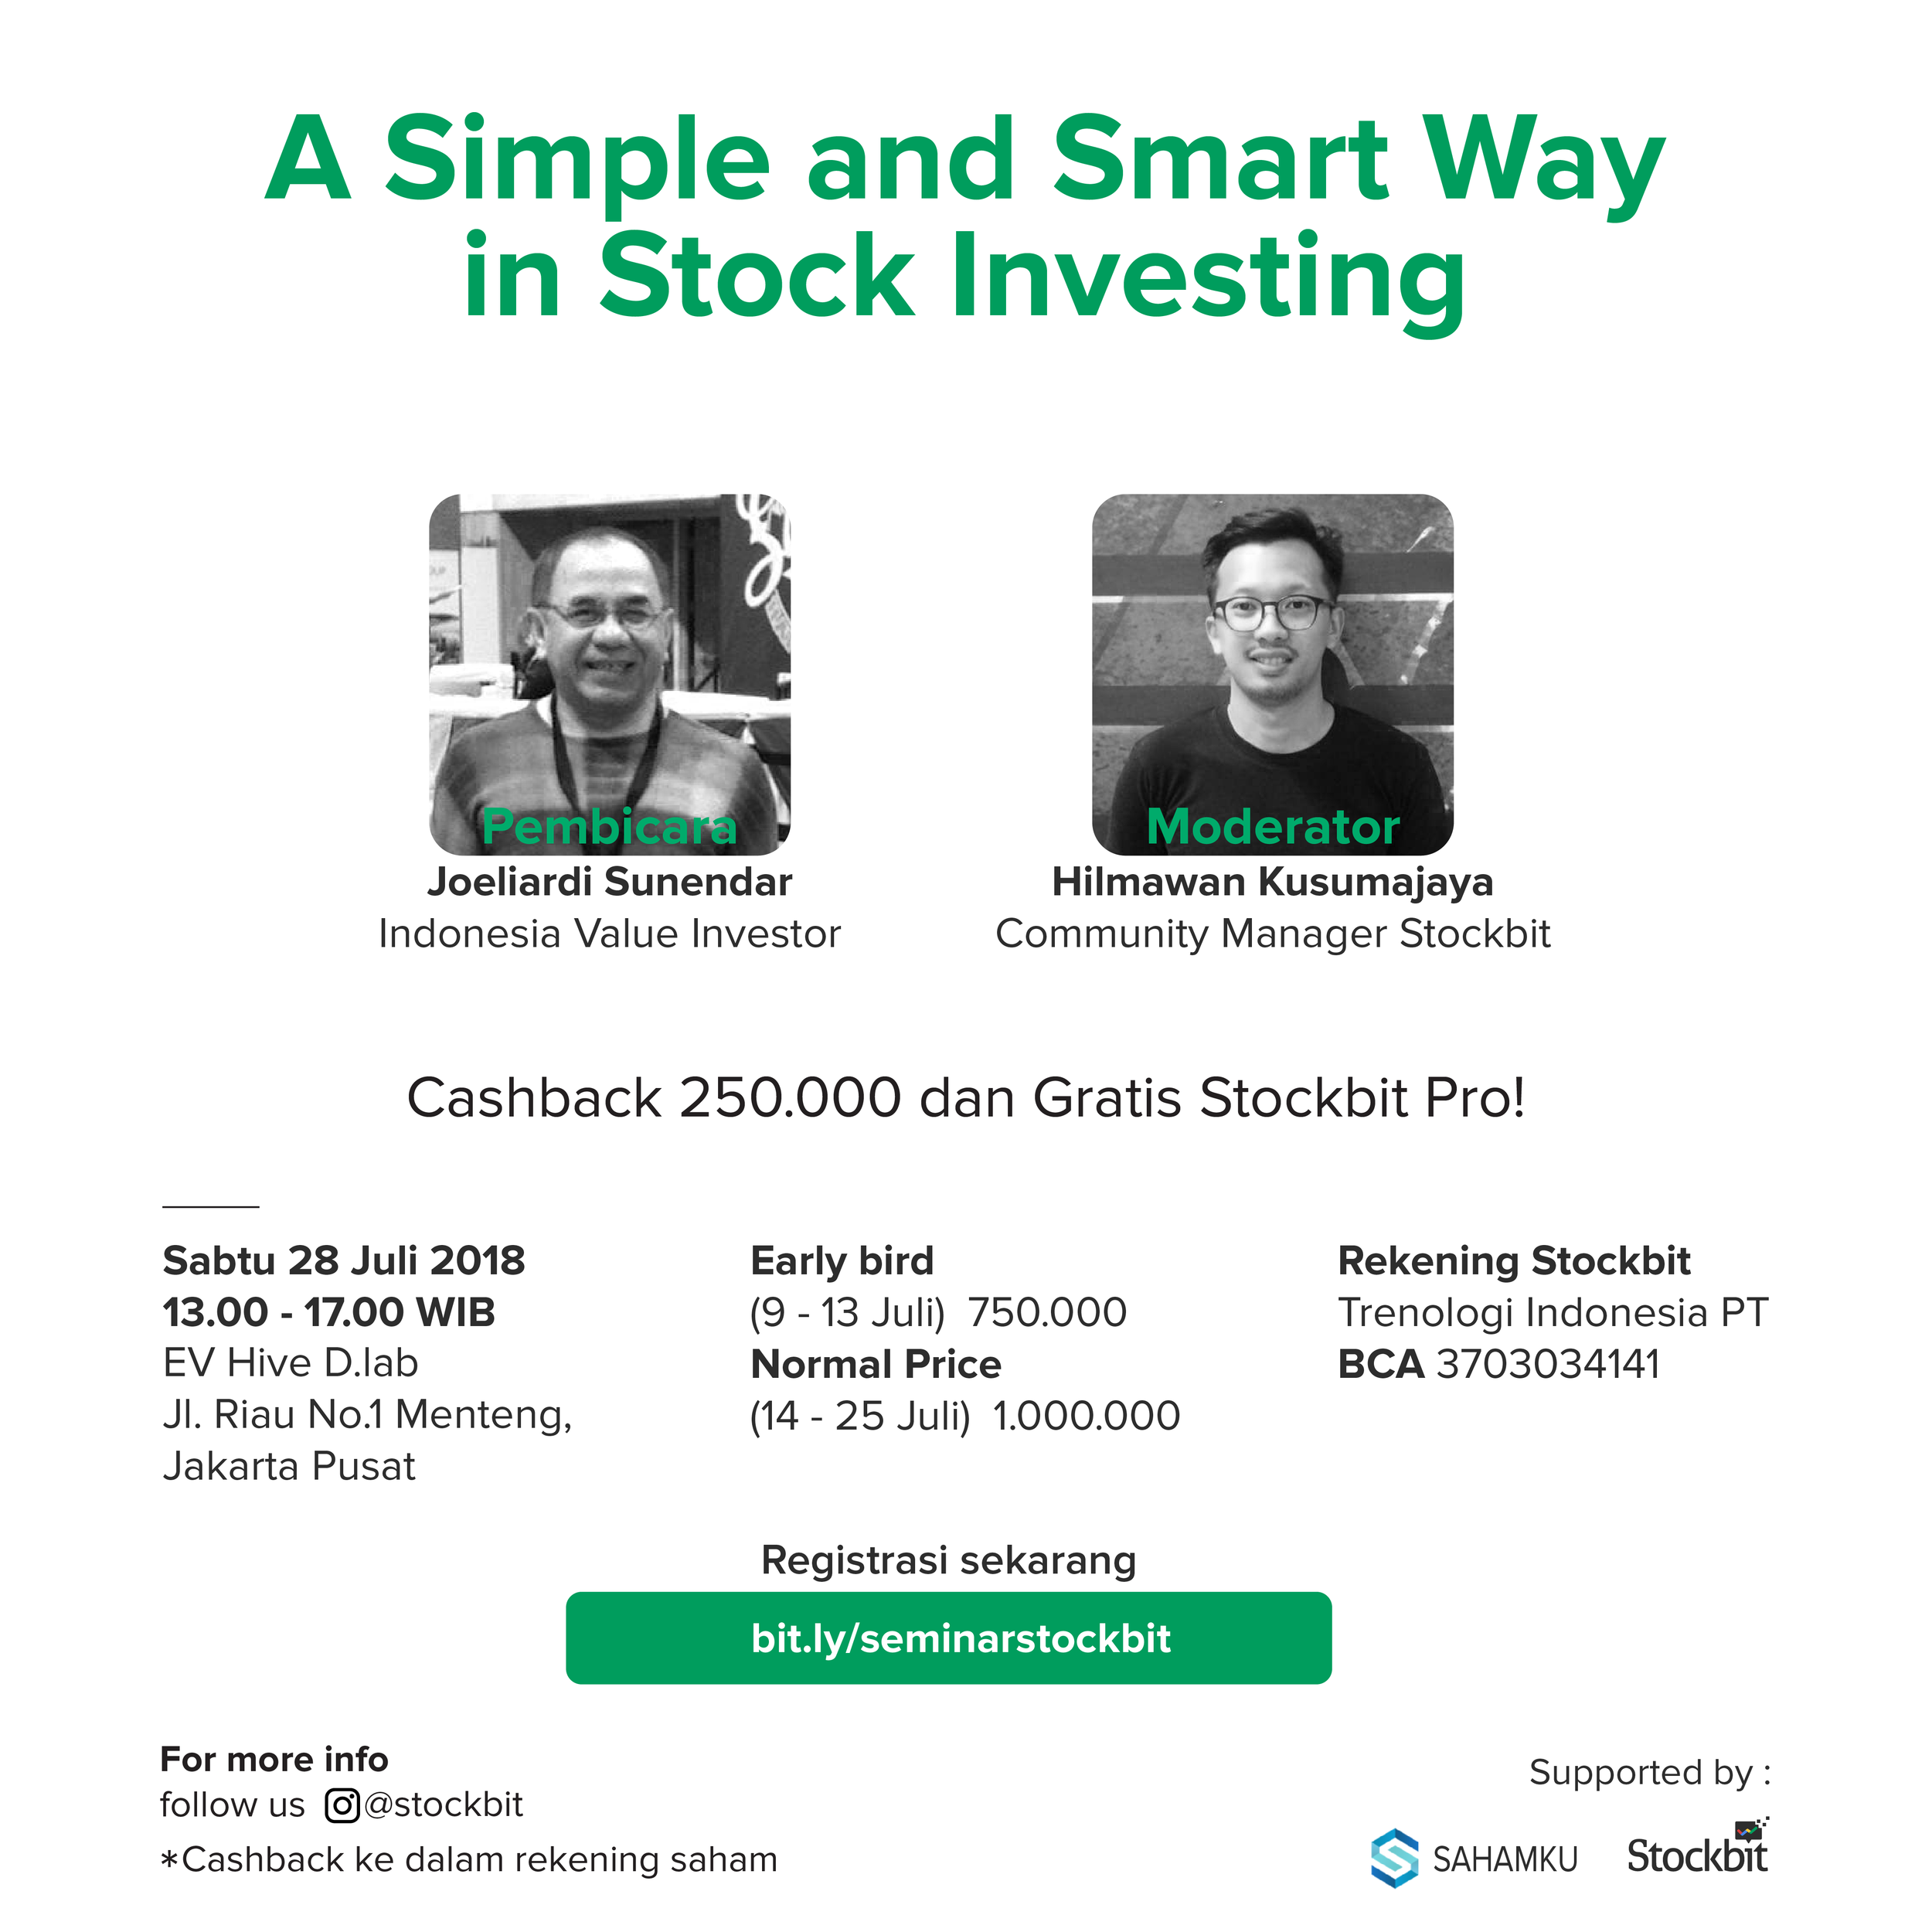 school investing stockbit-02.png